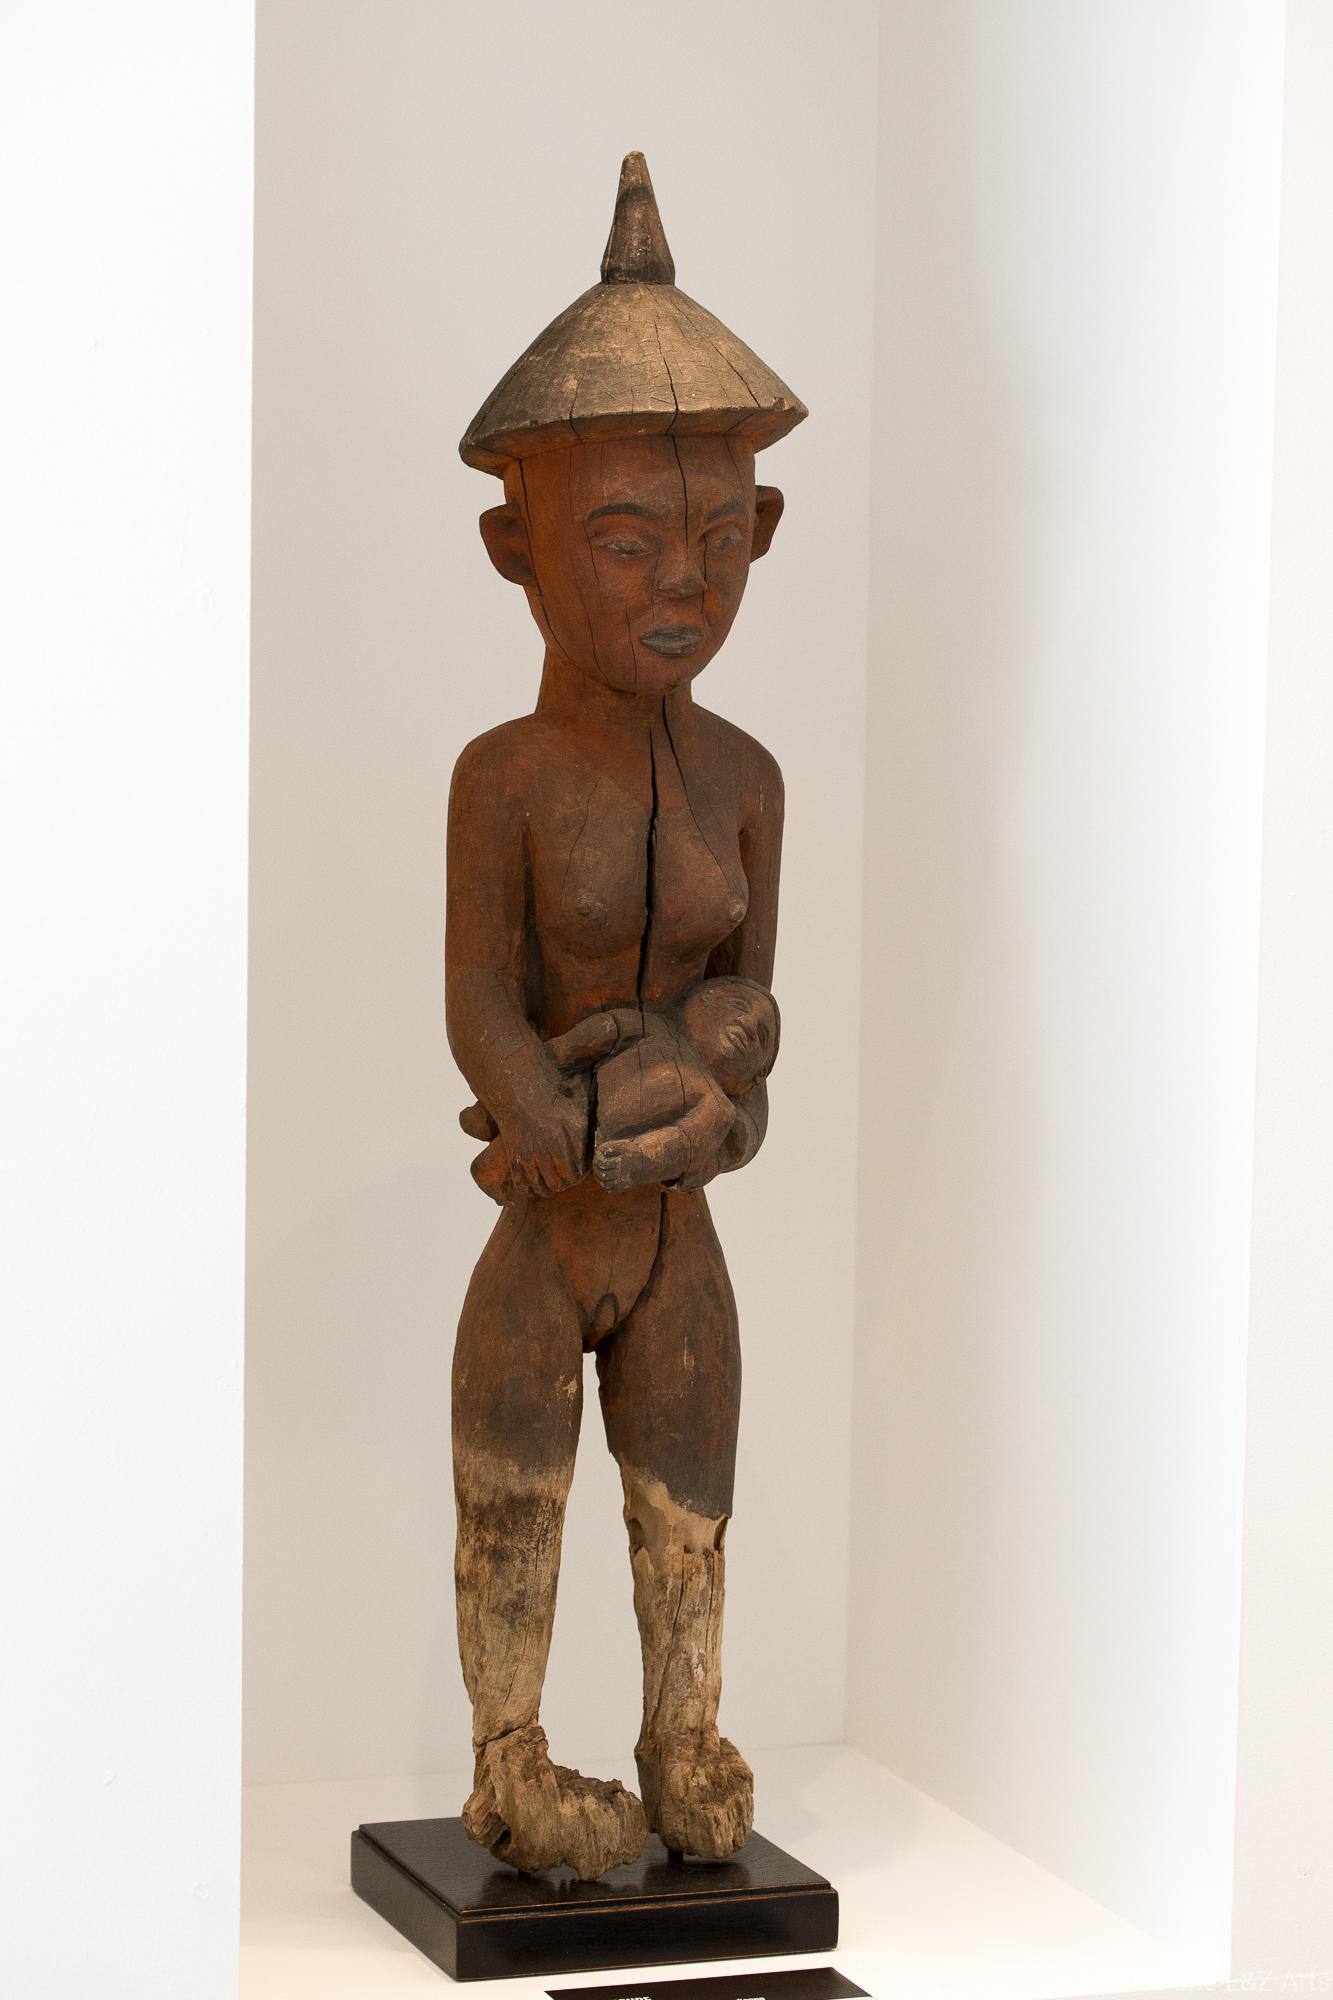 exposition-tribal-art-oostende-ostende-belgique-africain-lz-arts-2.jpg